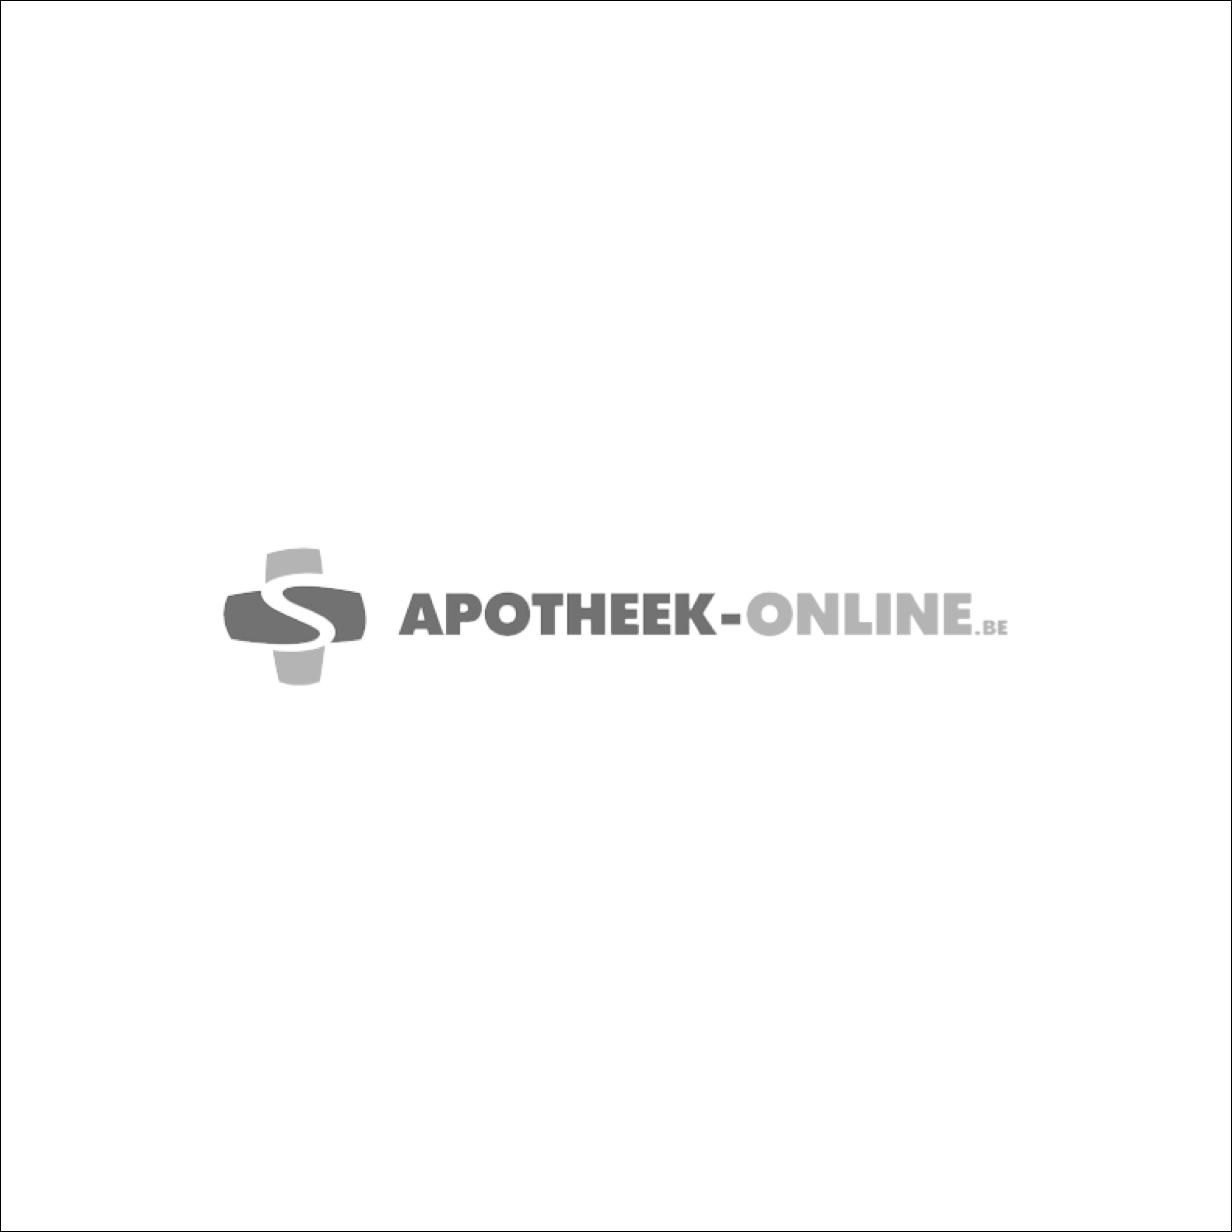 MESORB CP STER ABS 13X15CM 1 677201